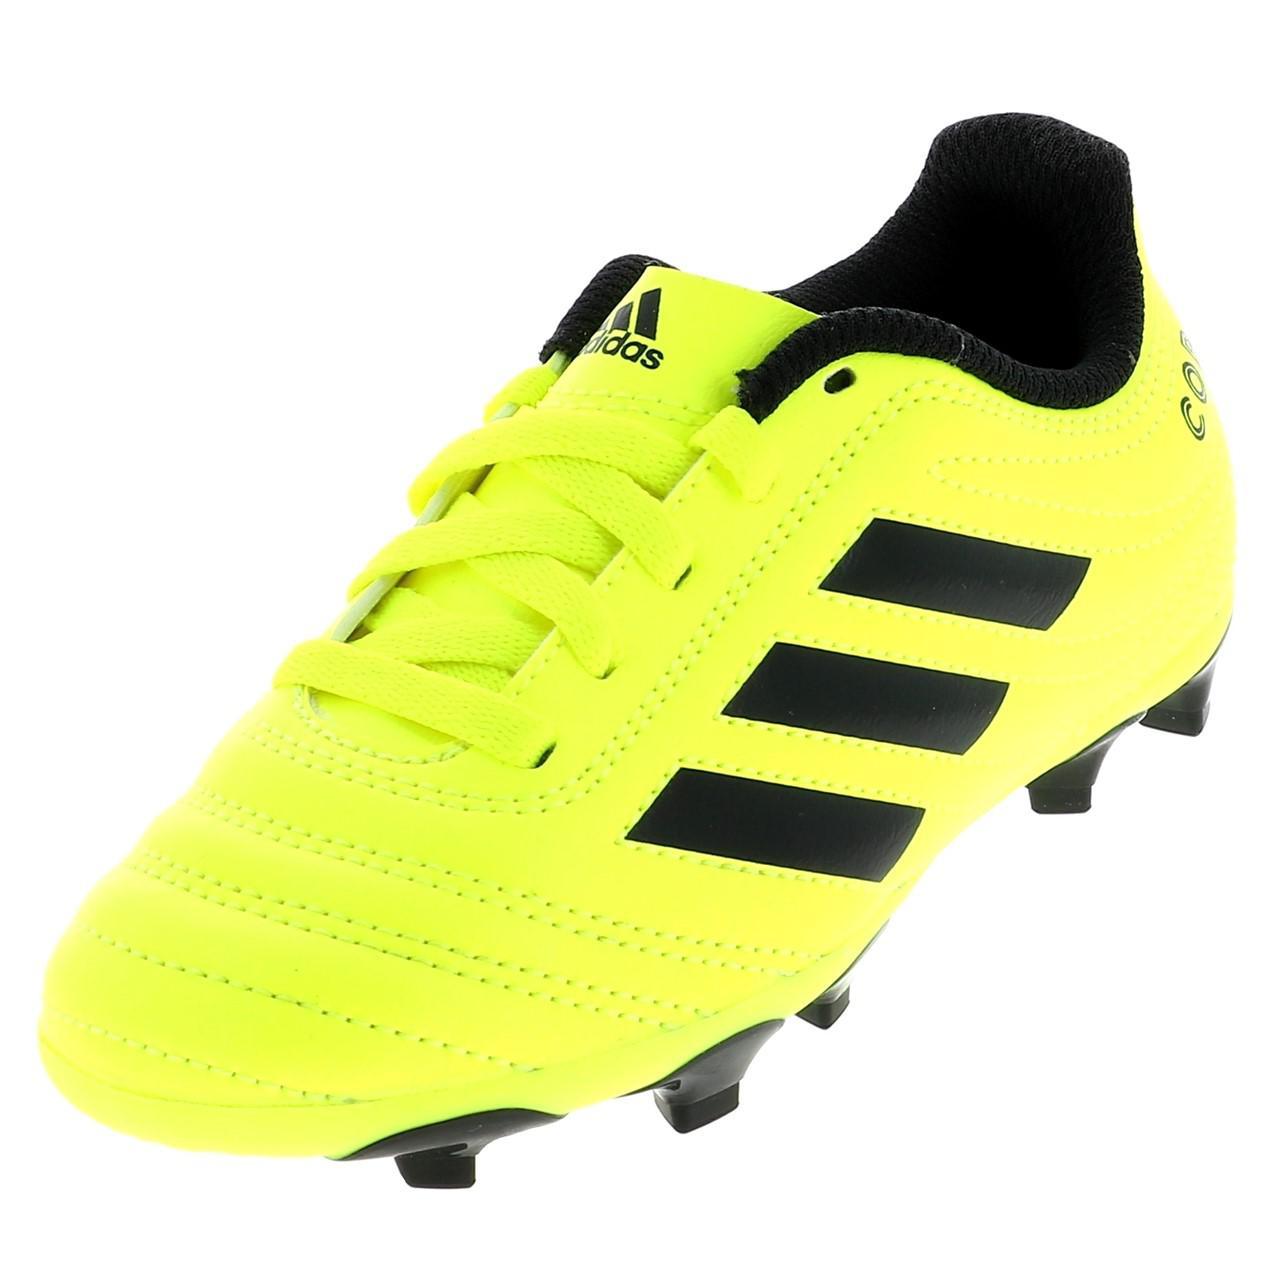 CHAUSSURES FOOTBALL LAMELLES Adidas Copa 19.4 fg jr Jaune